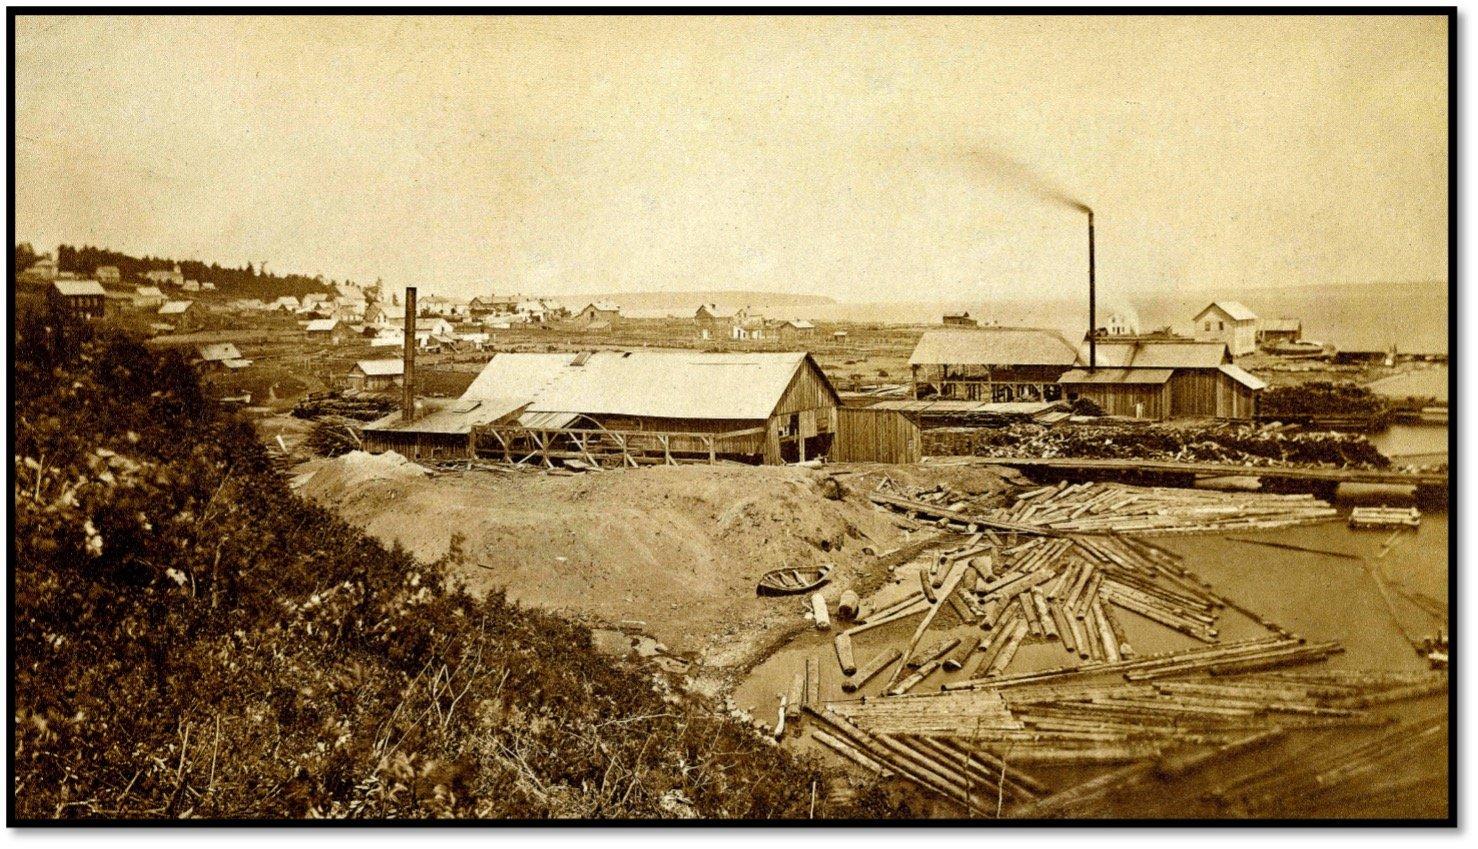 R.D. Pike Lumber Mill ca 1875 Photo BHA 1999.25.006